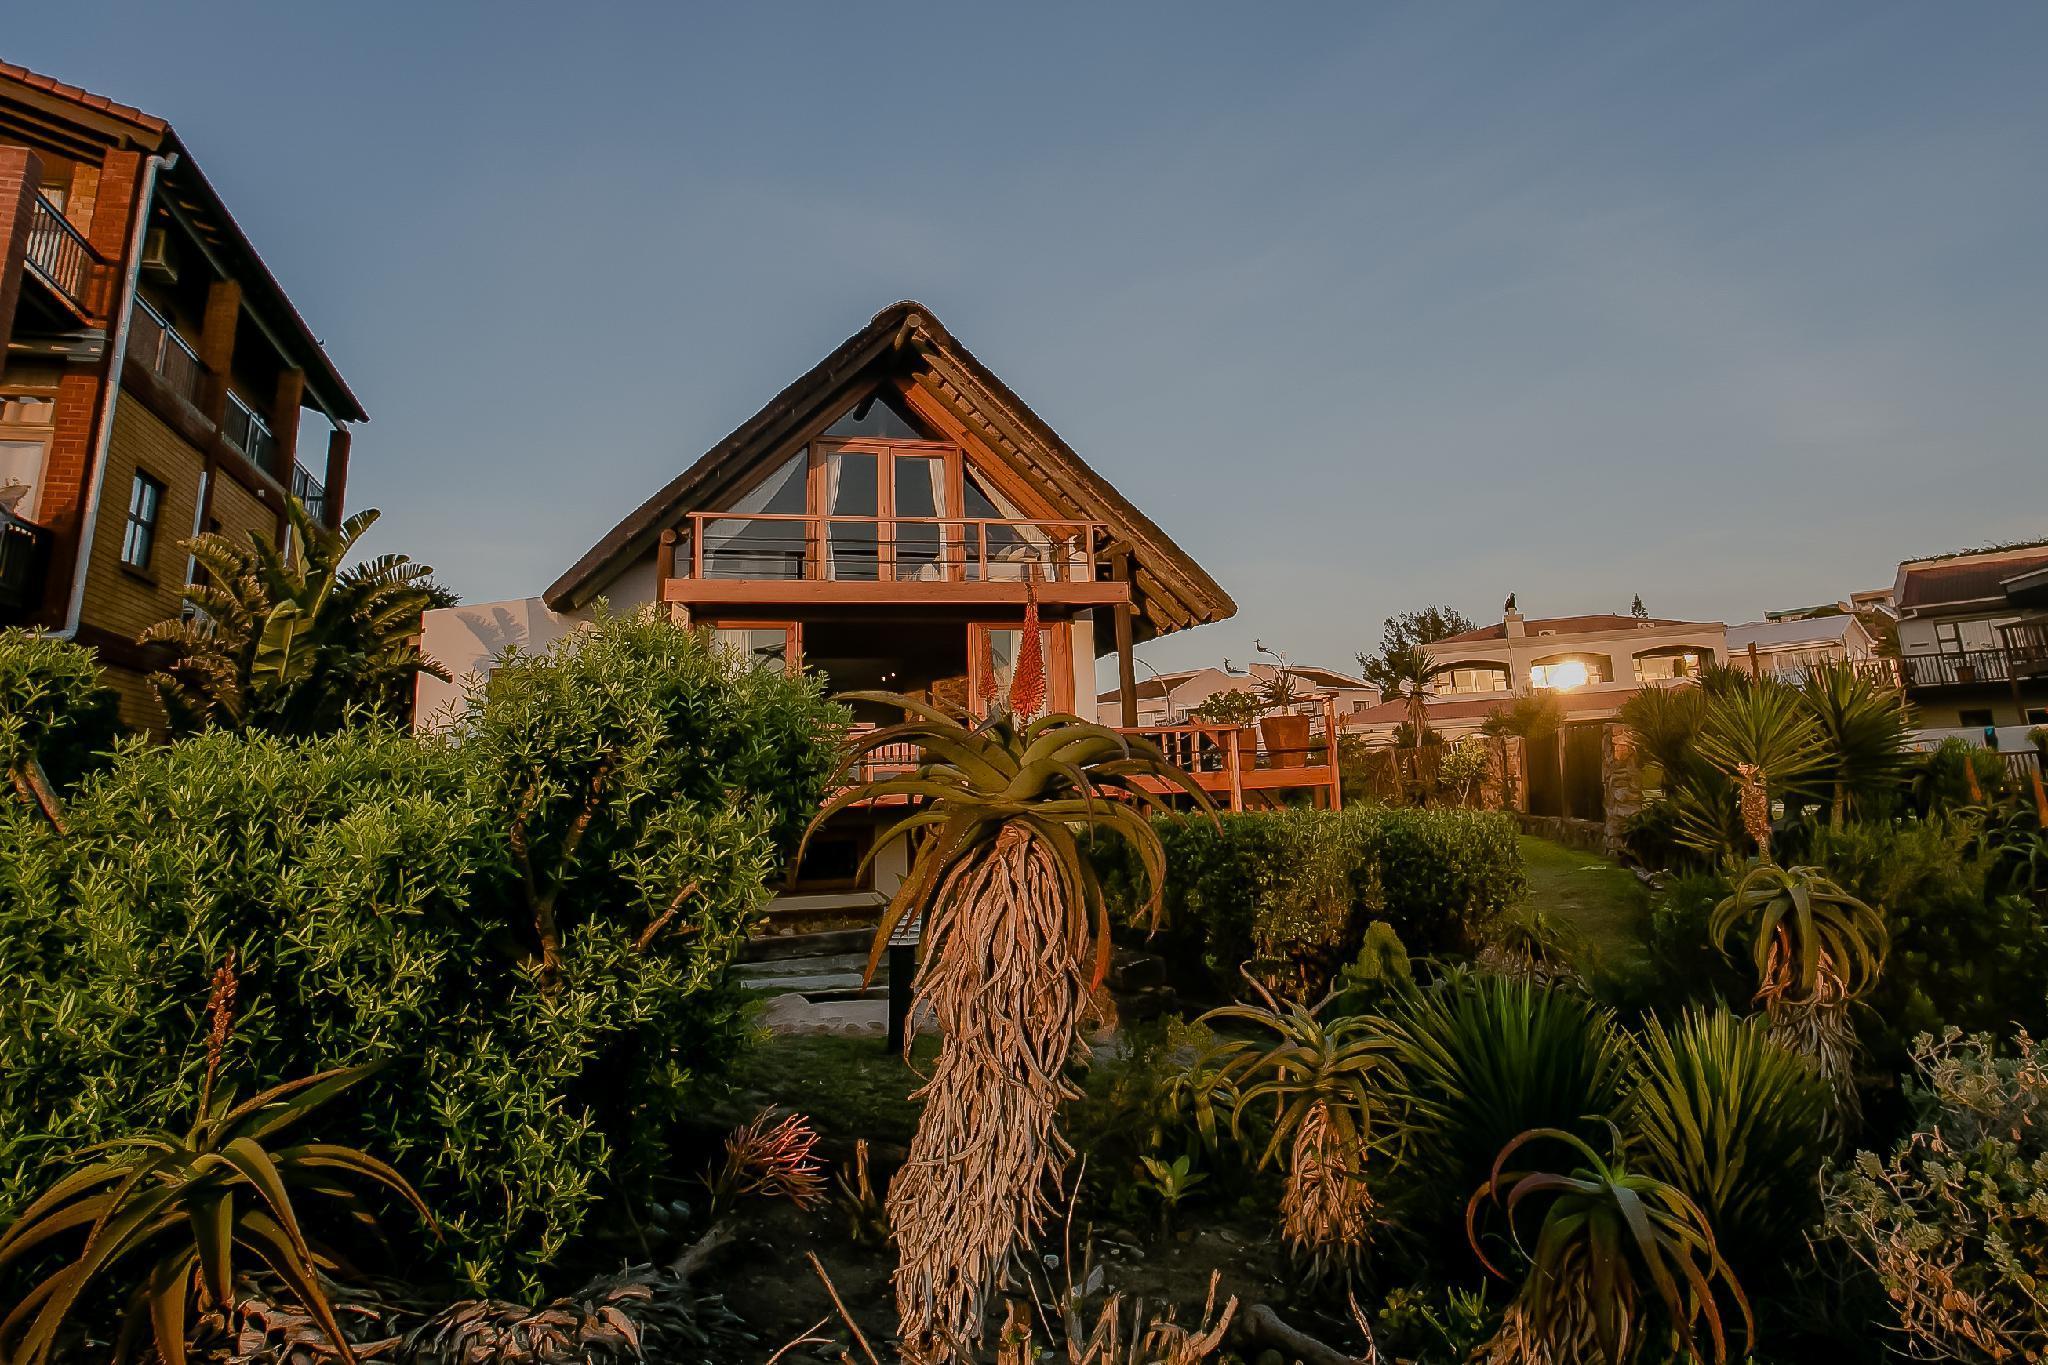 Dreamland Beach House And Studio's @ Supertubes.